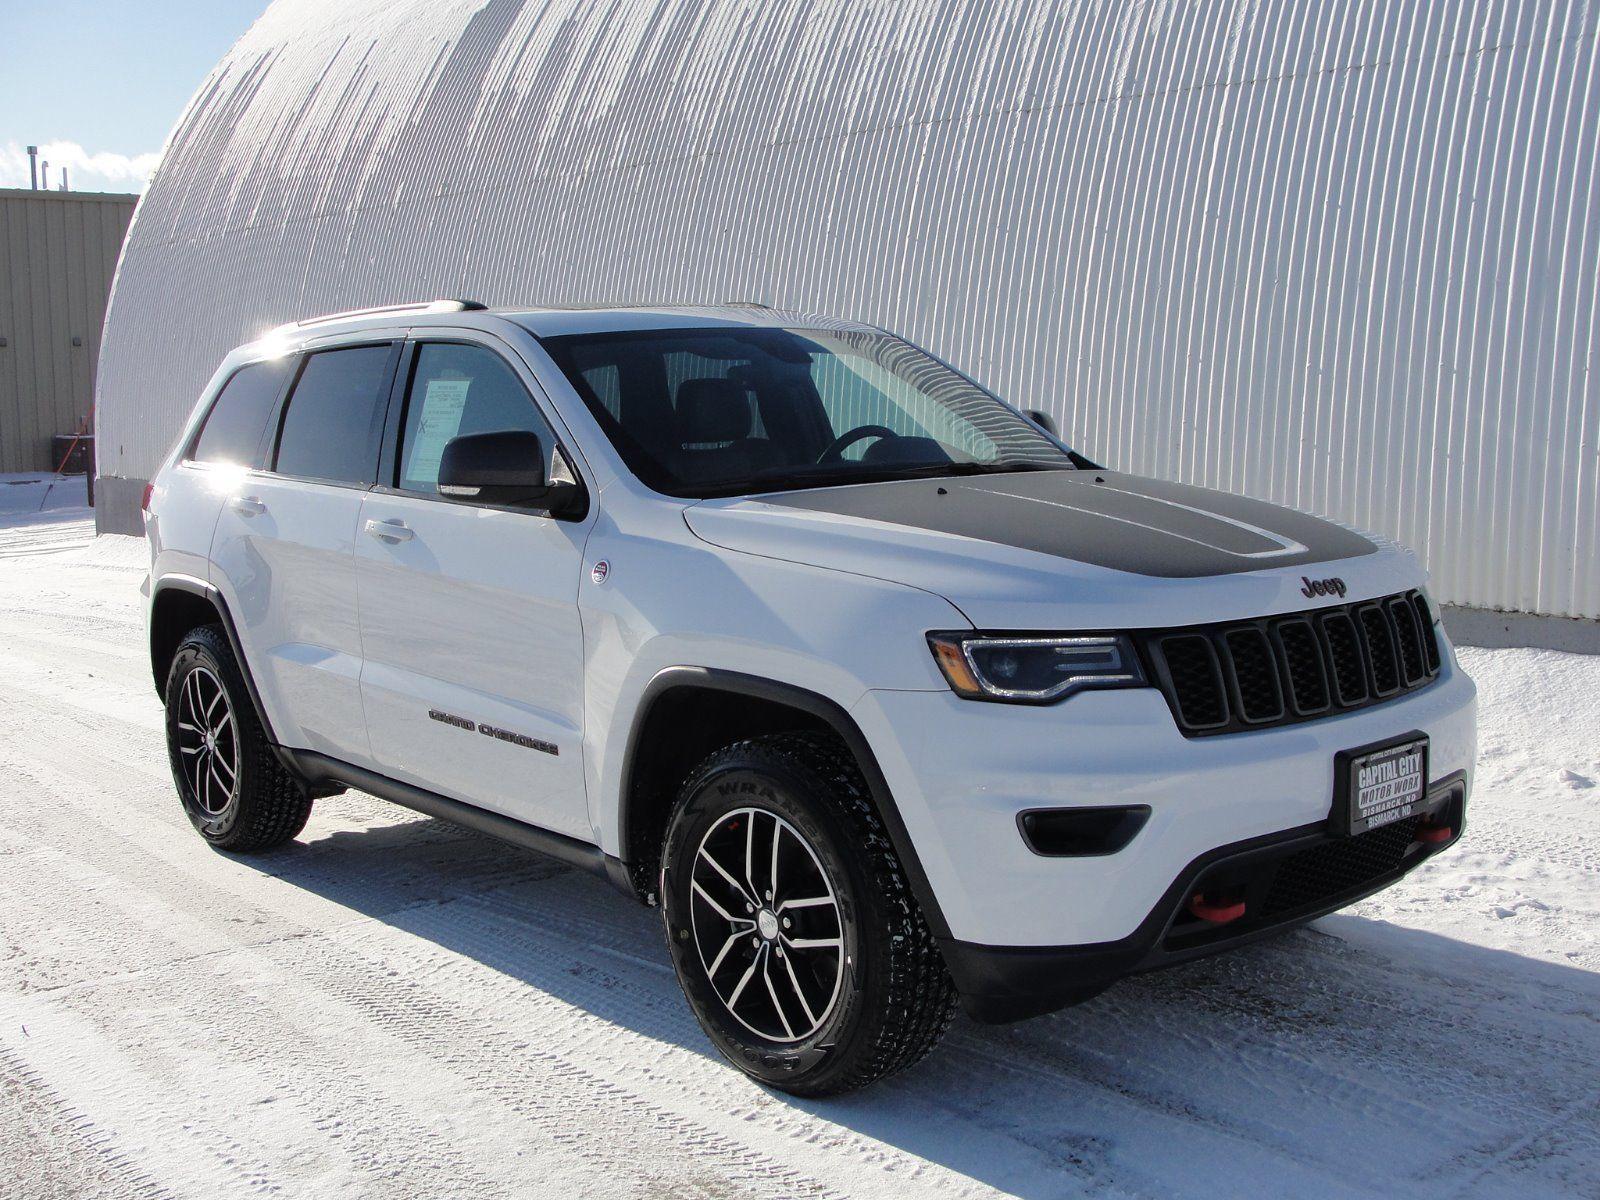 Used 2017 Jeep Grand Cherokee Trailhawk 4wd 2017 Jeep Grand